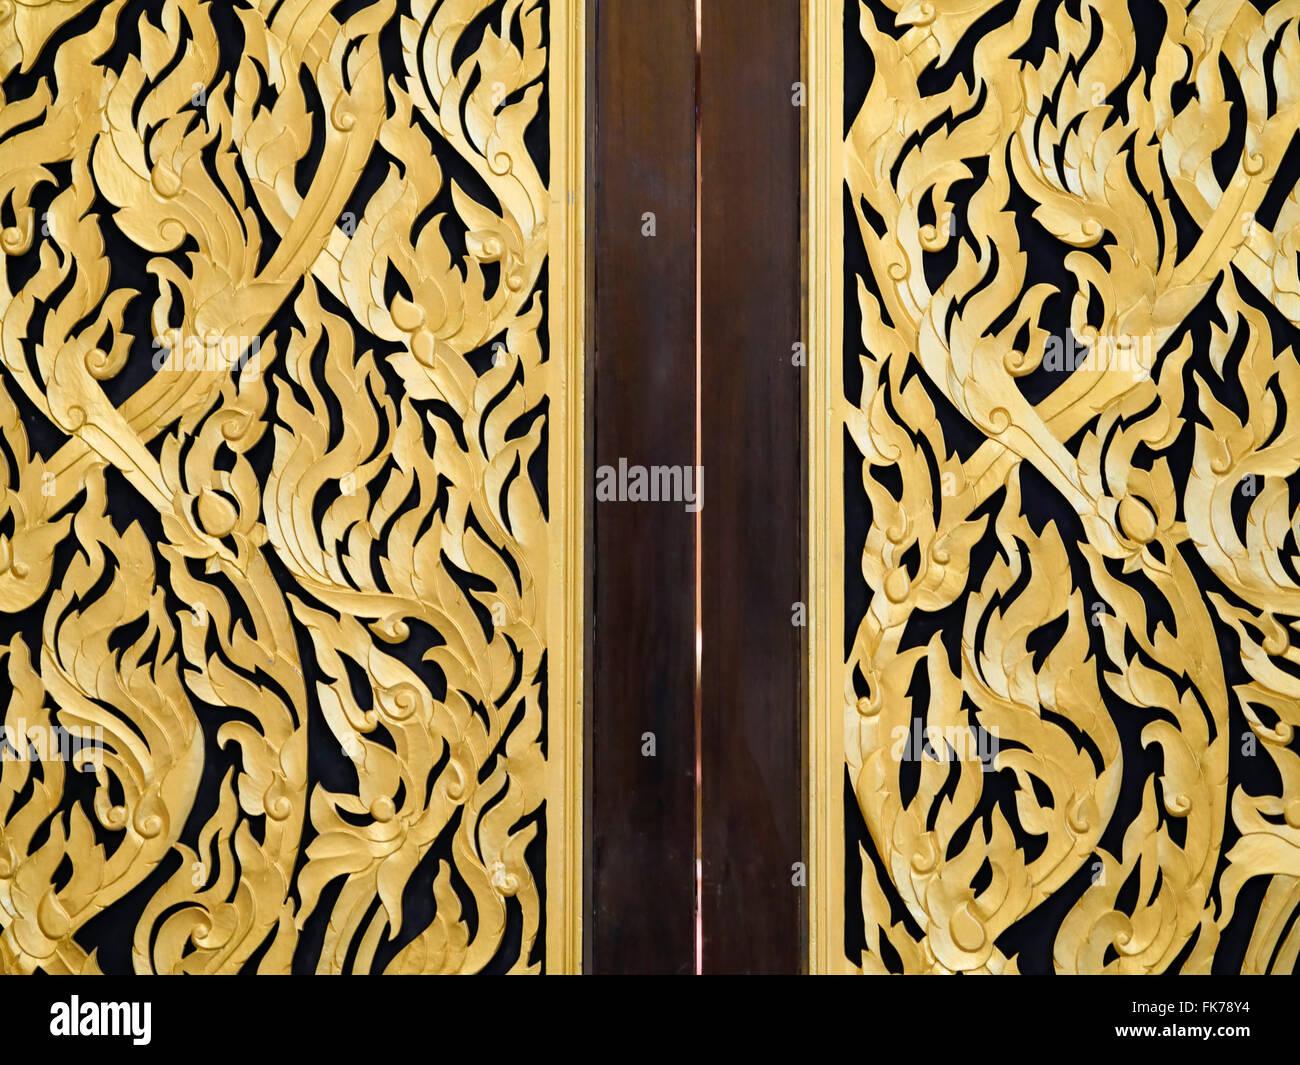 Thai painting on the door of meeting room (rented room) - Stock Image